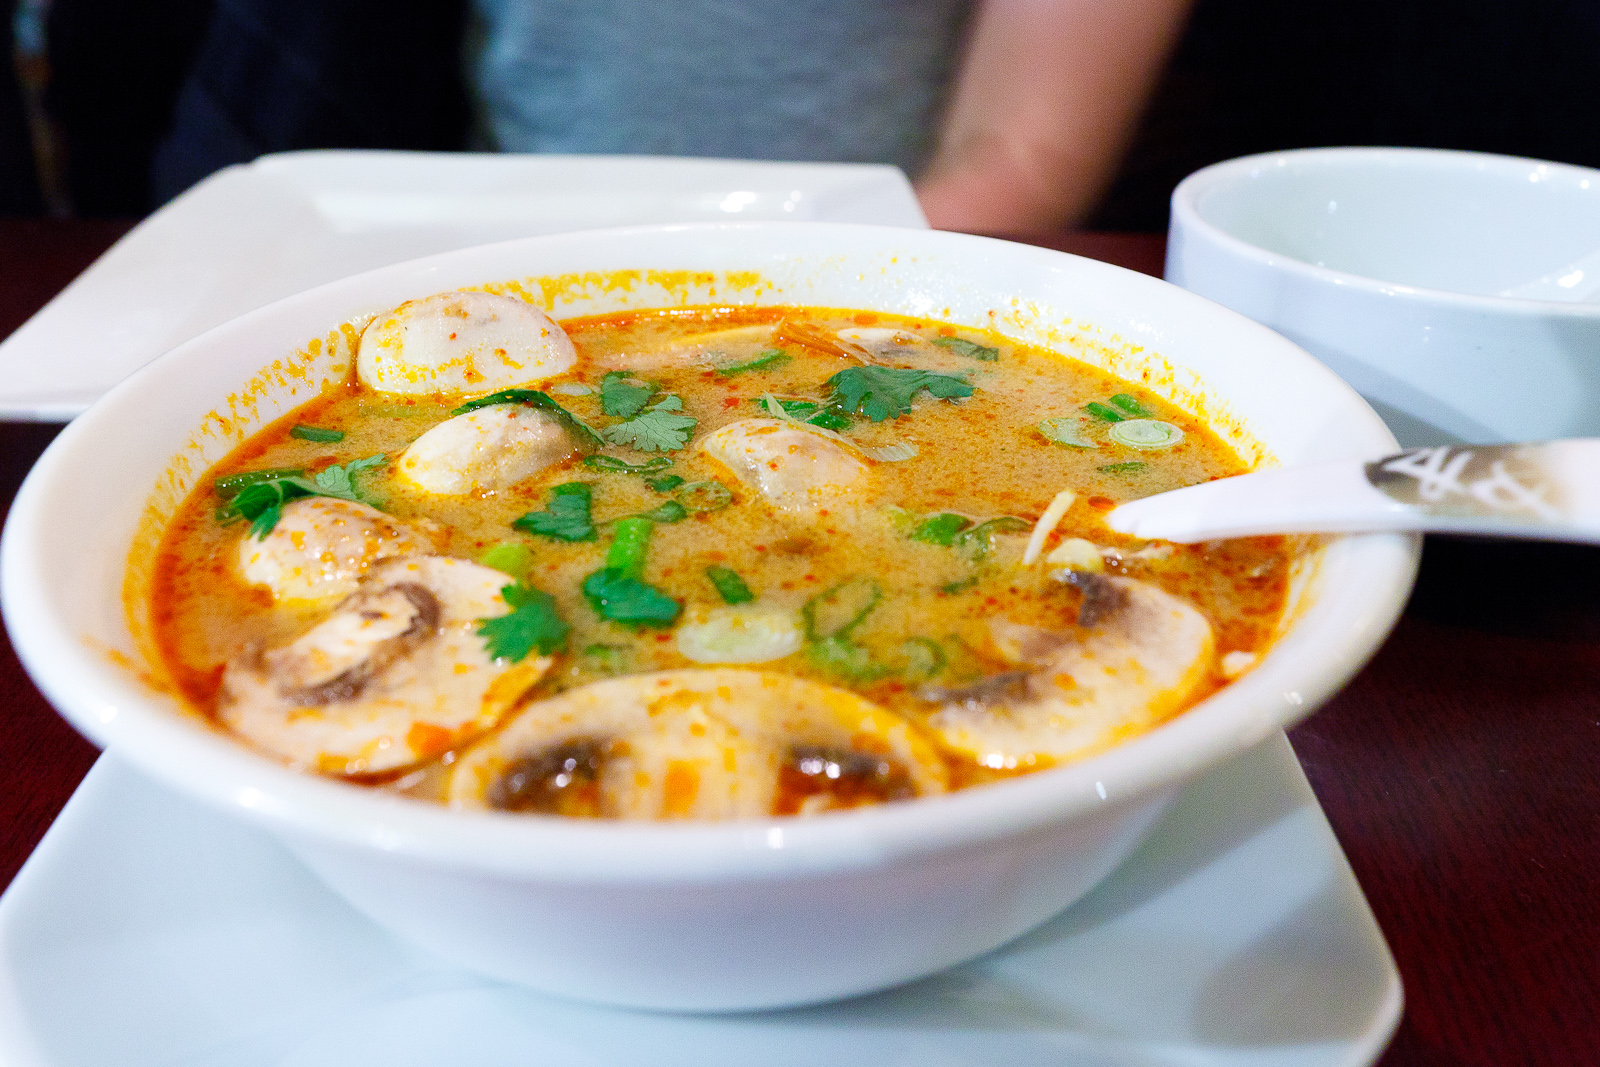 Tom yum goong ($5)